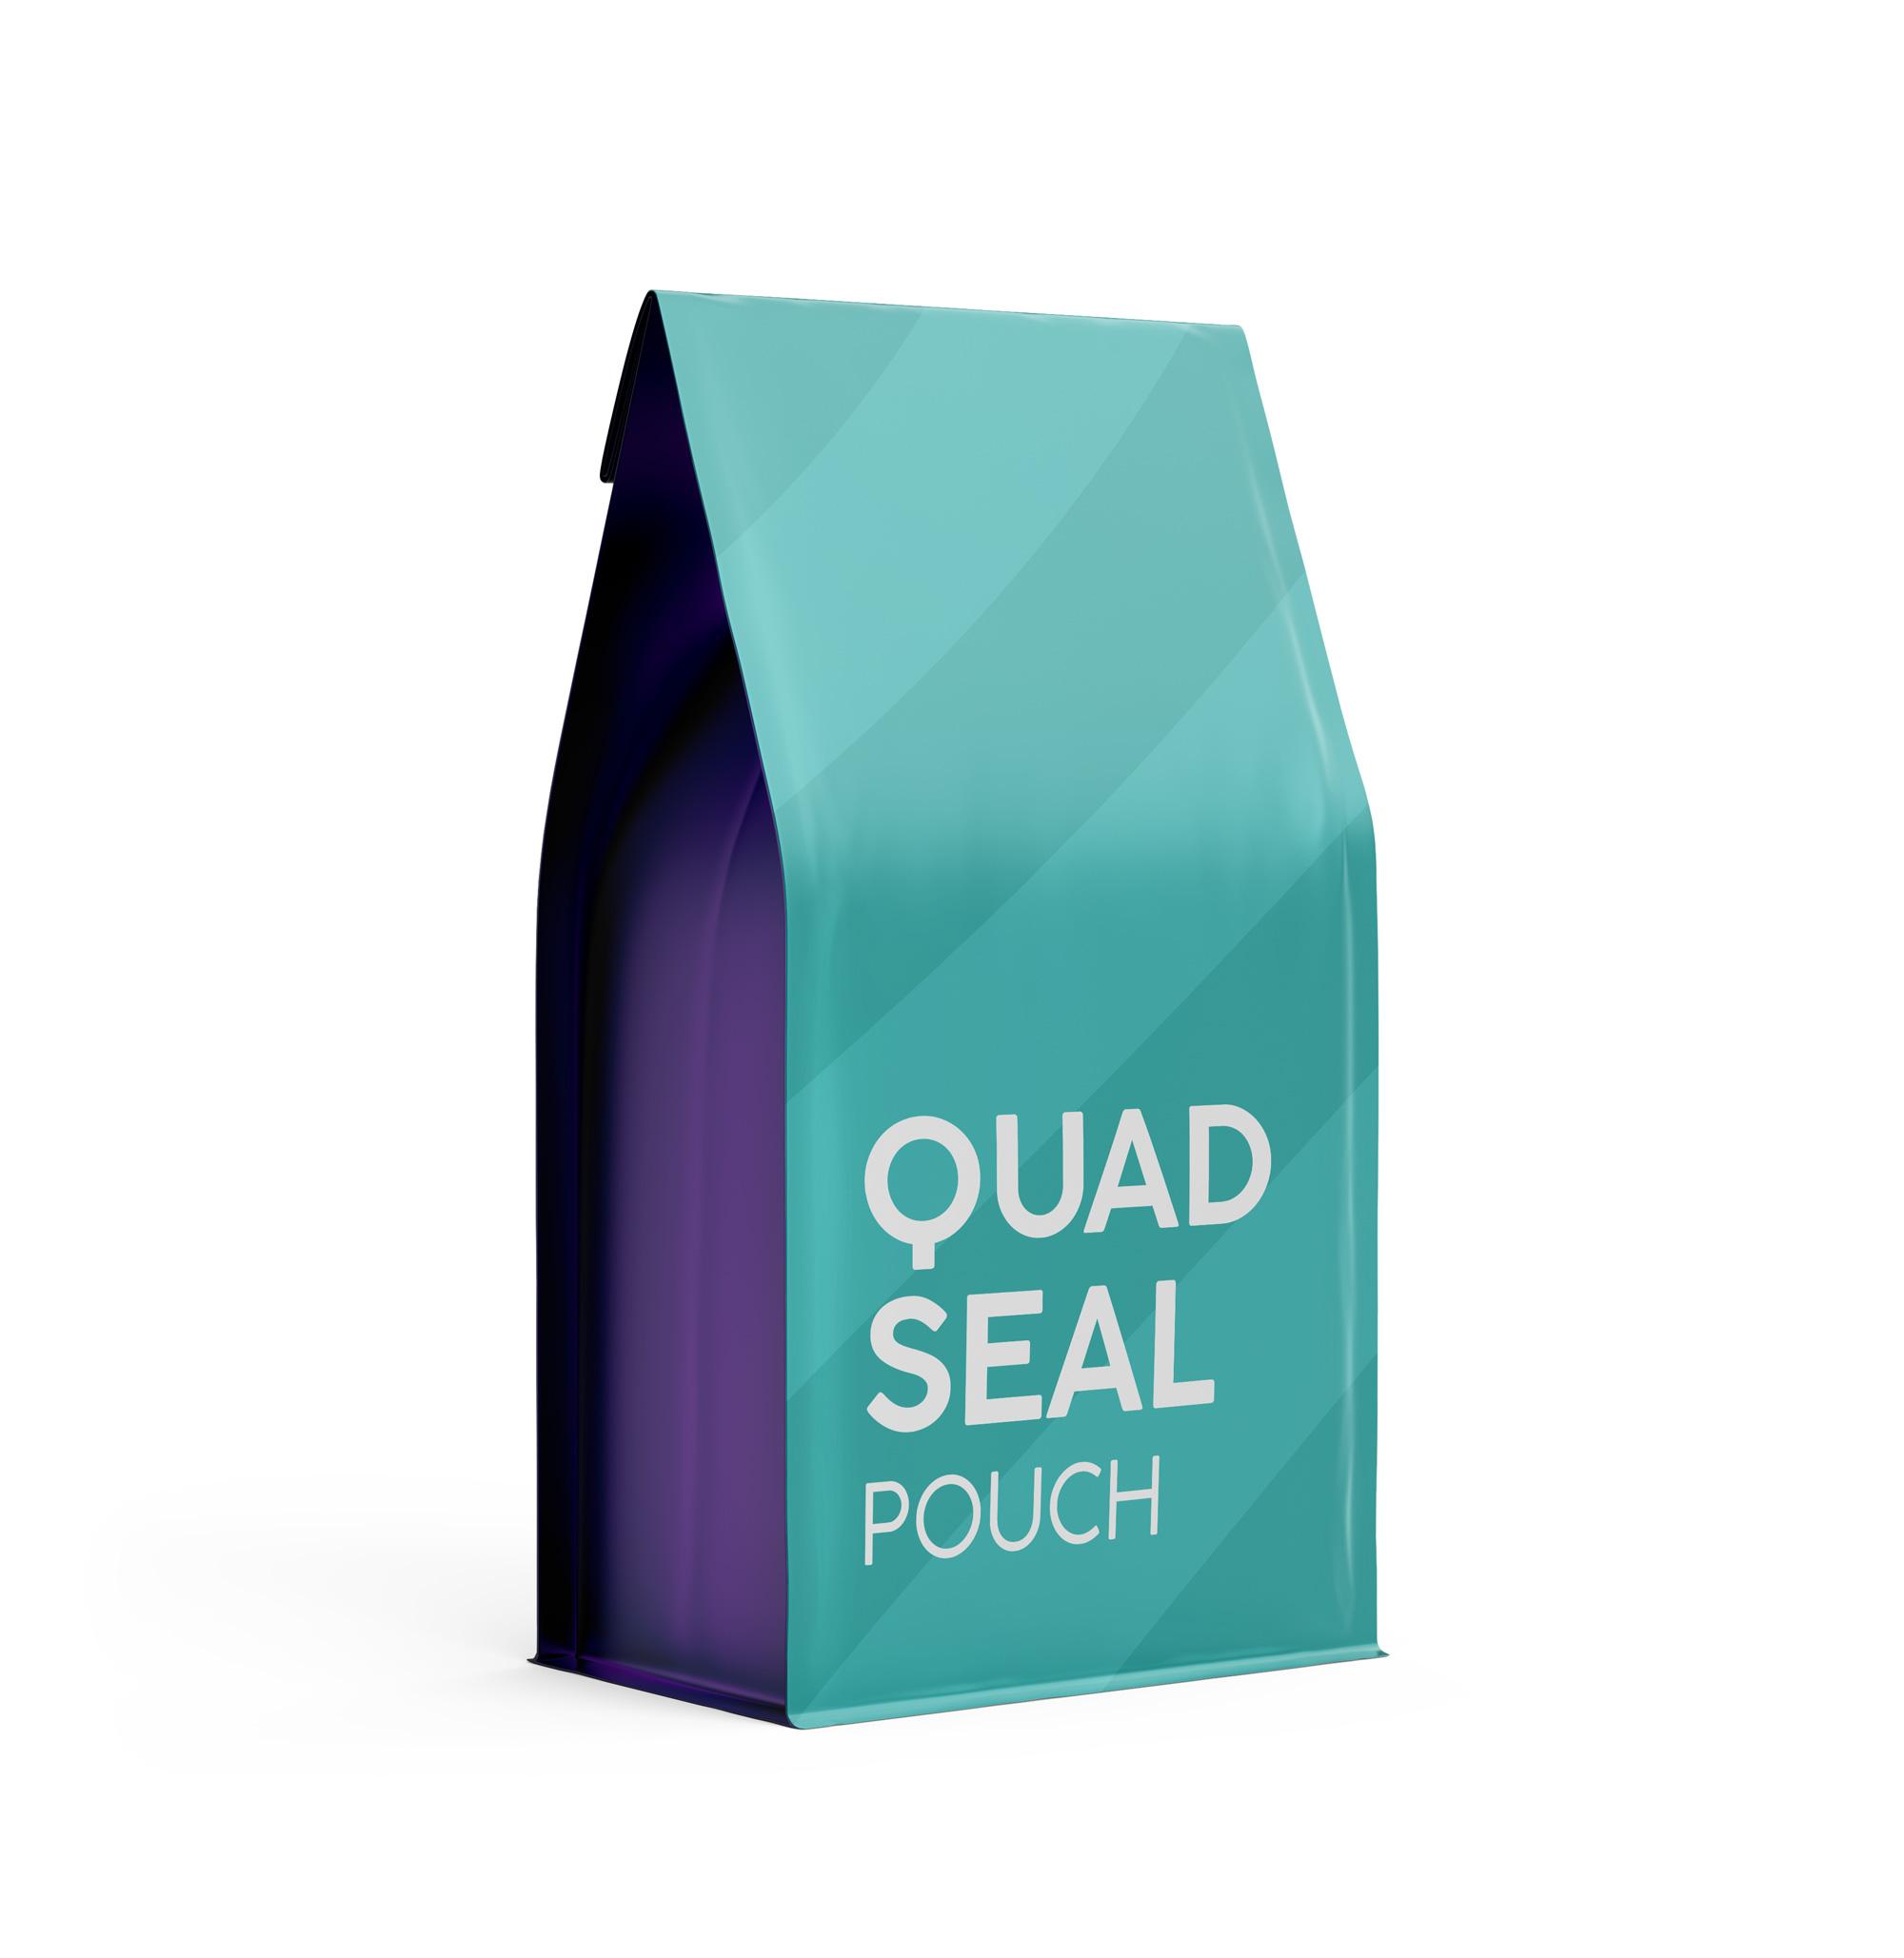 Quad Seal Pouch